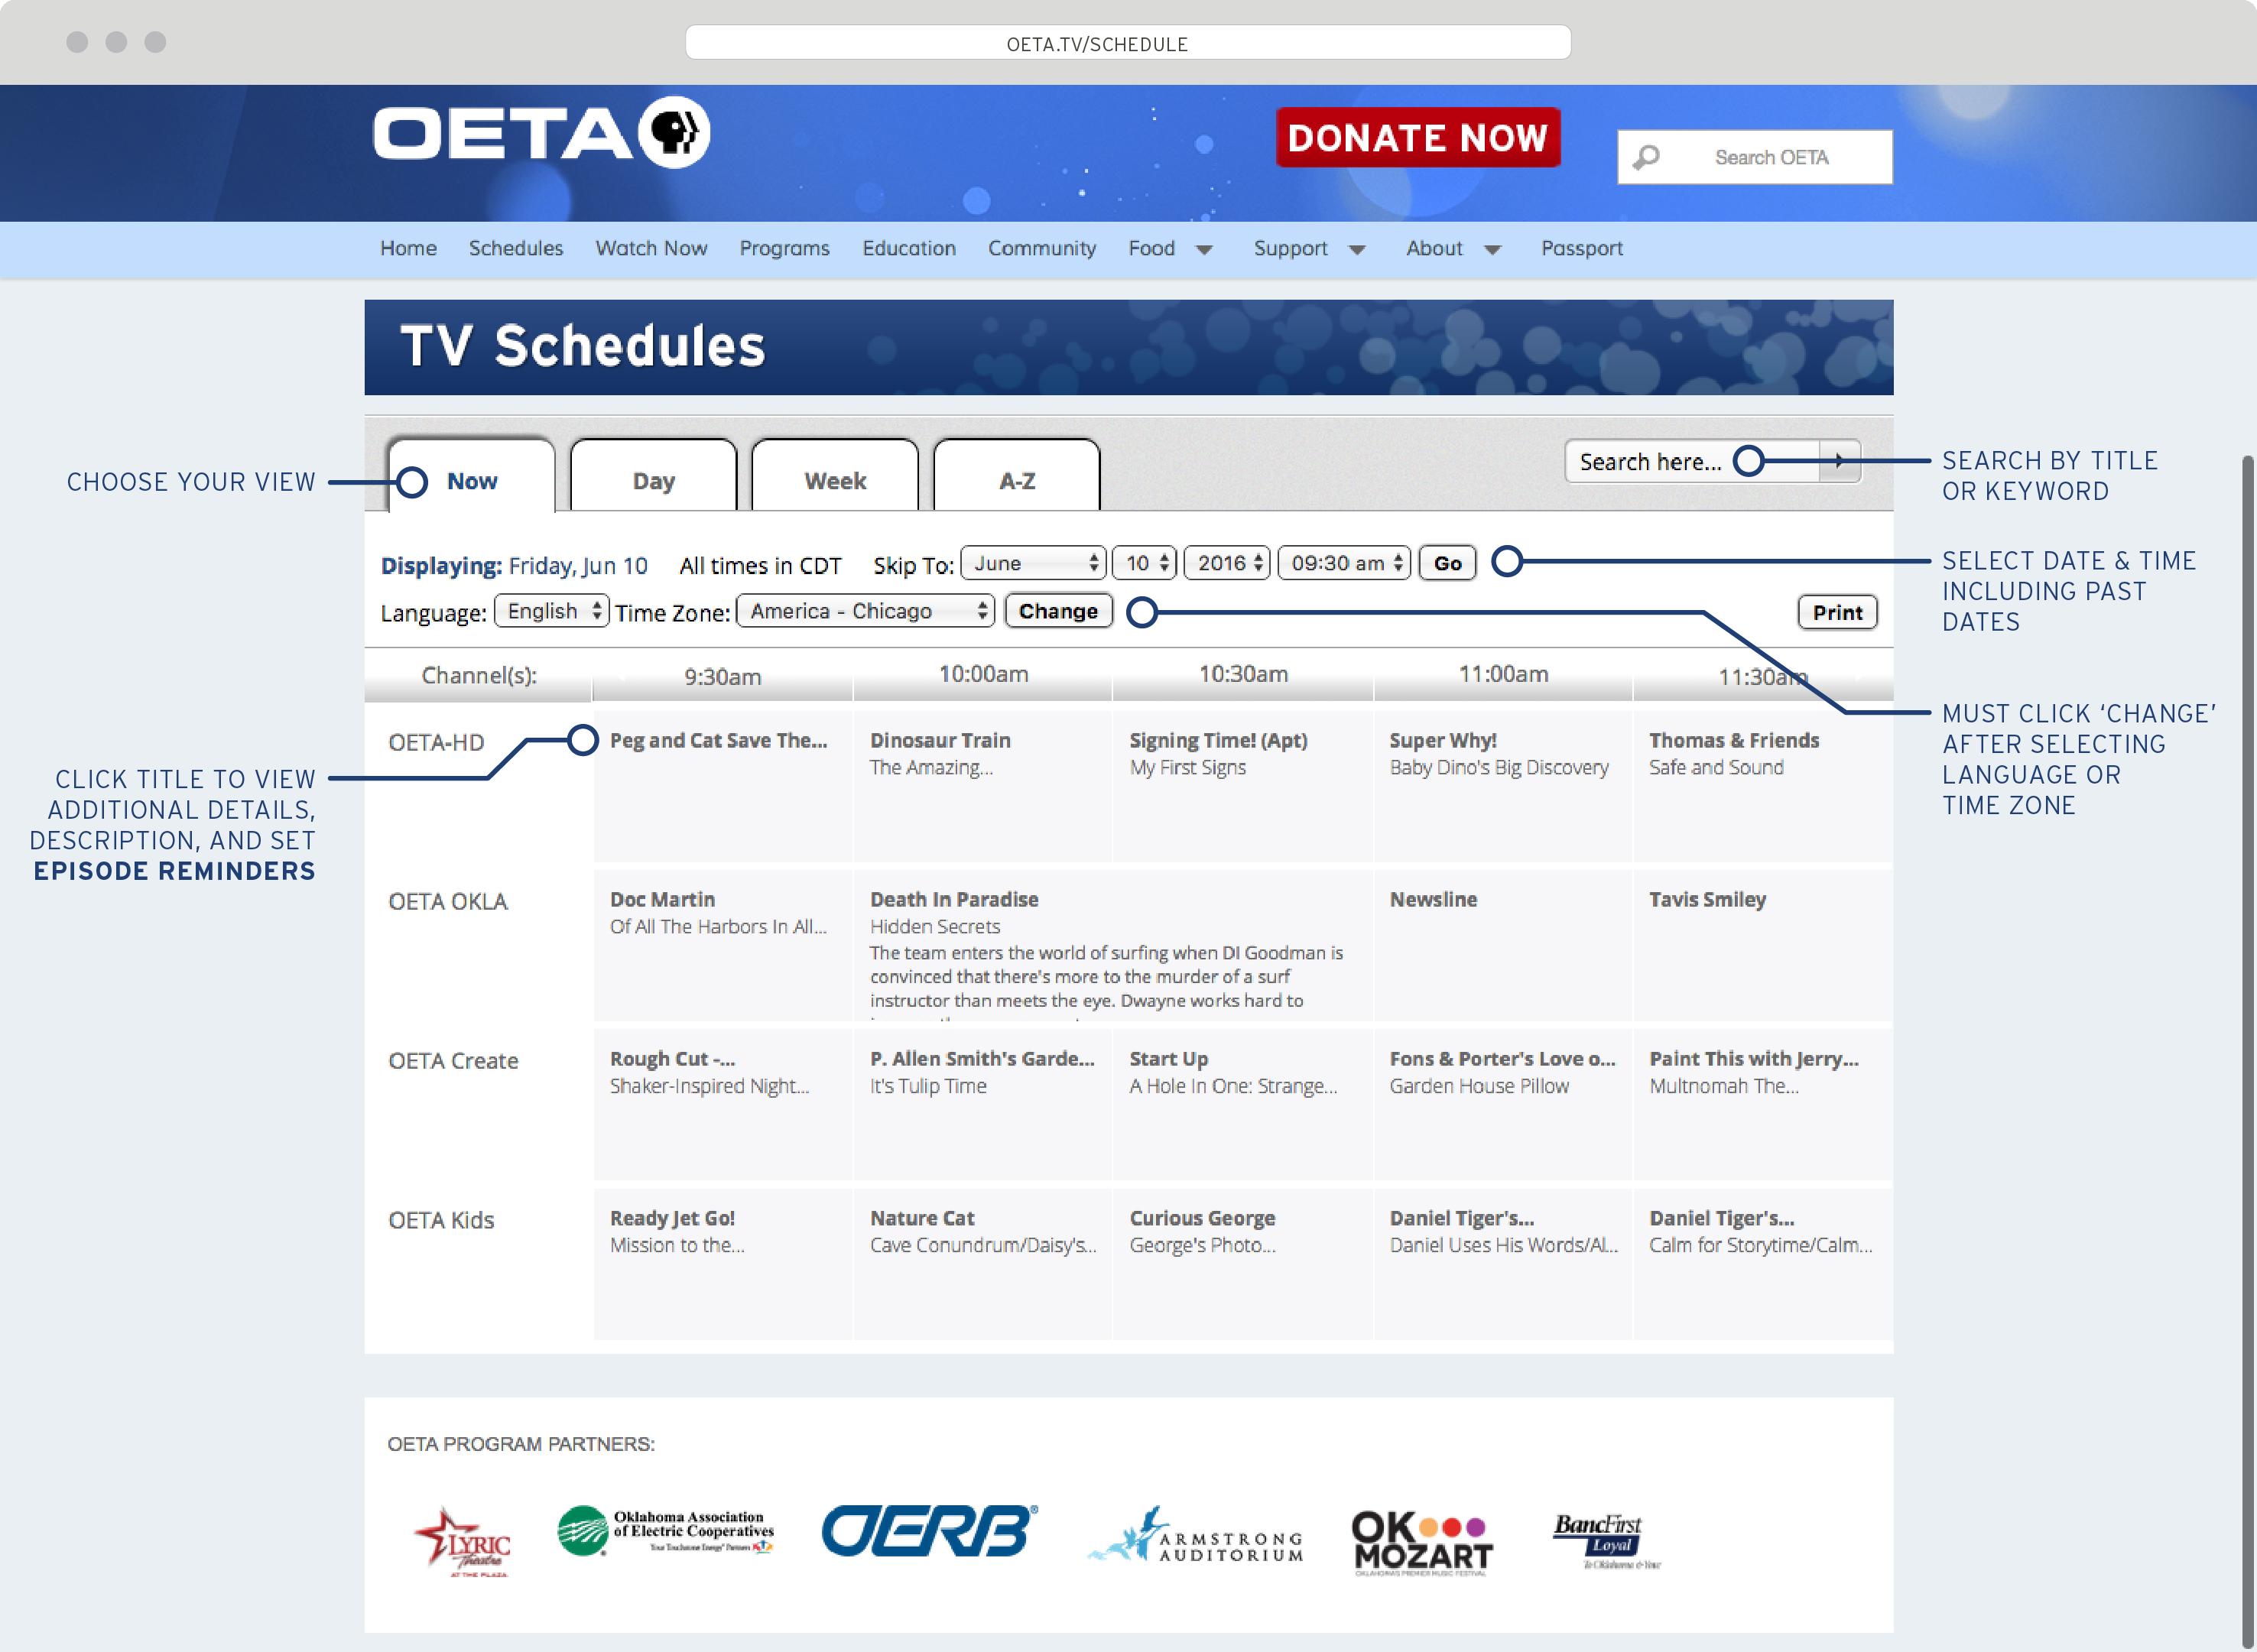 Image - OETA_Schedule.png